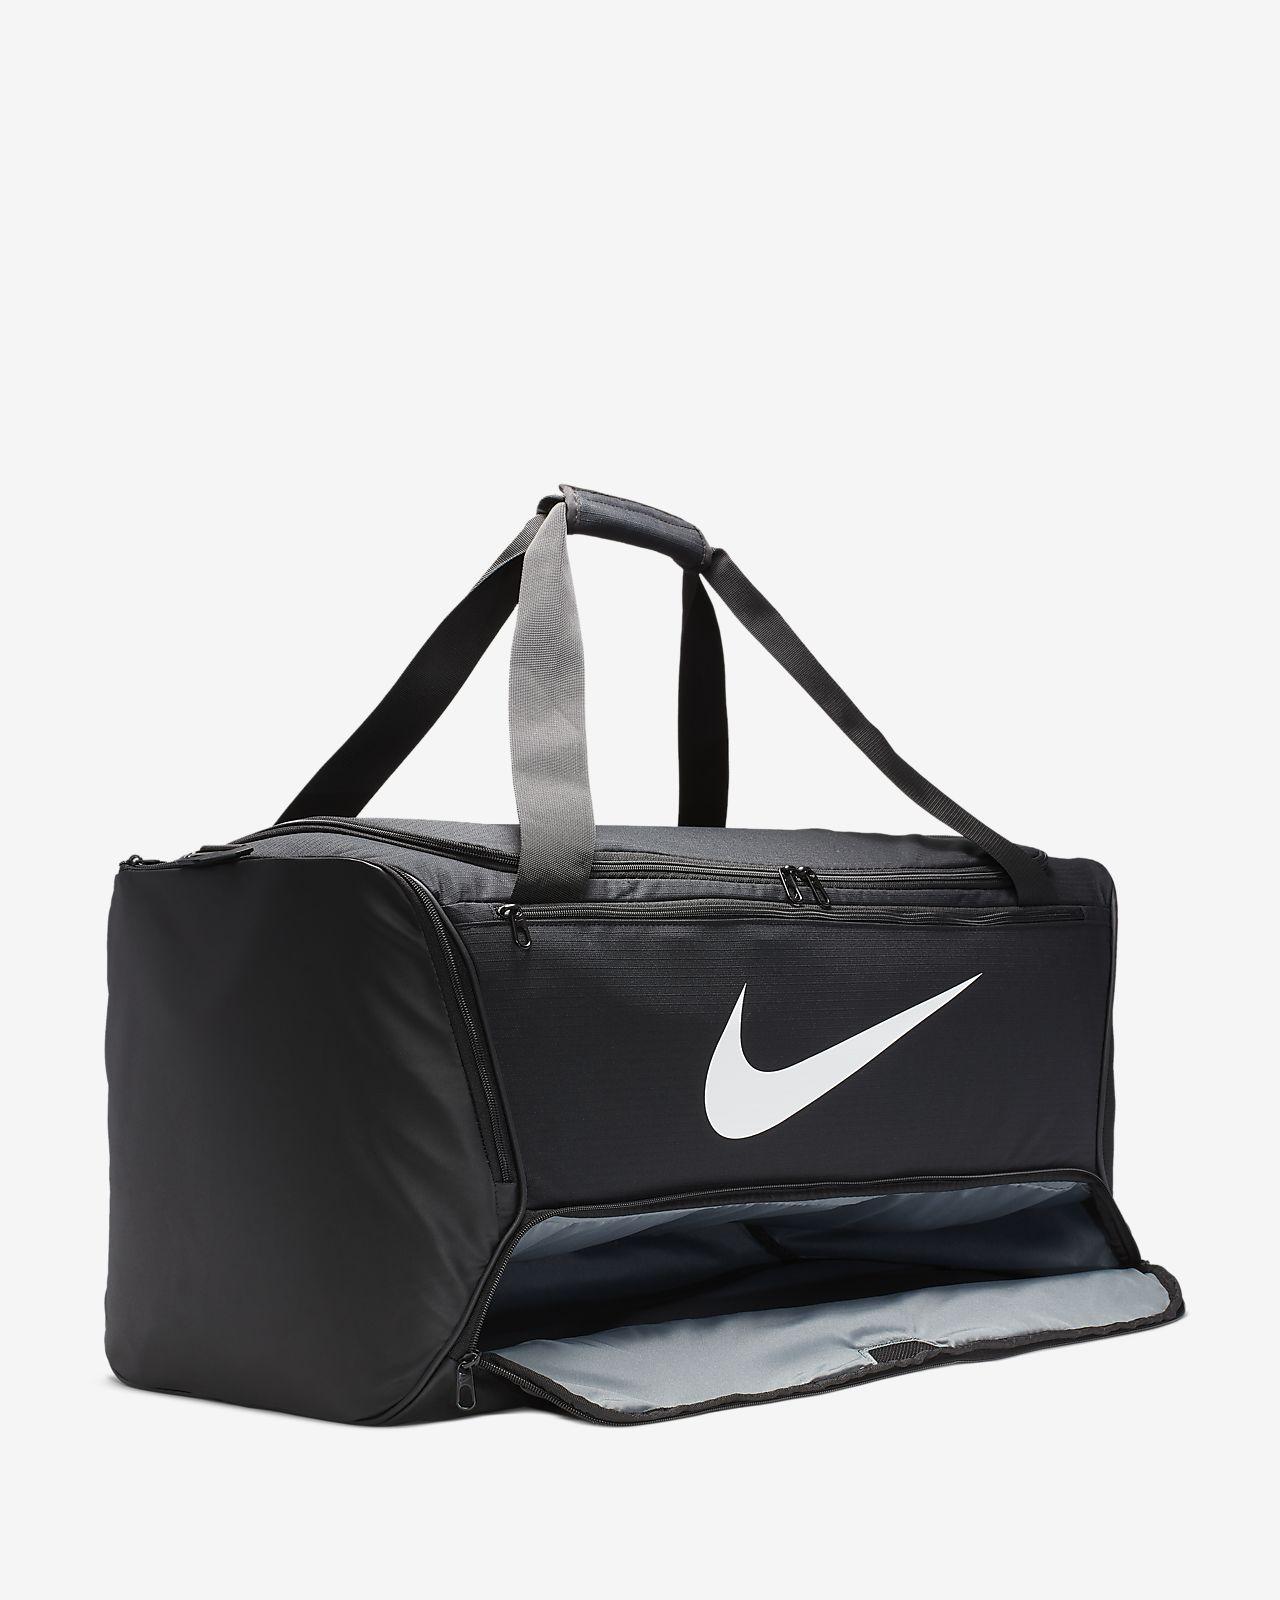 super popular hermoso estilo como escoger Nike Brasilia Bolsa de deporte de entrenamiento (grande). Nike ES